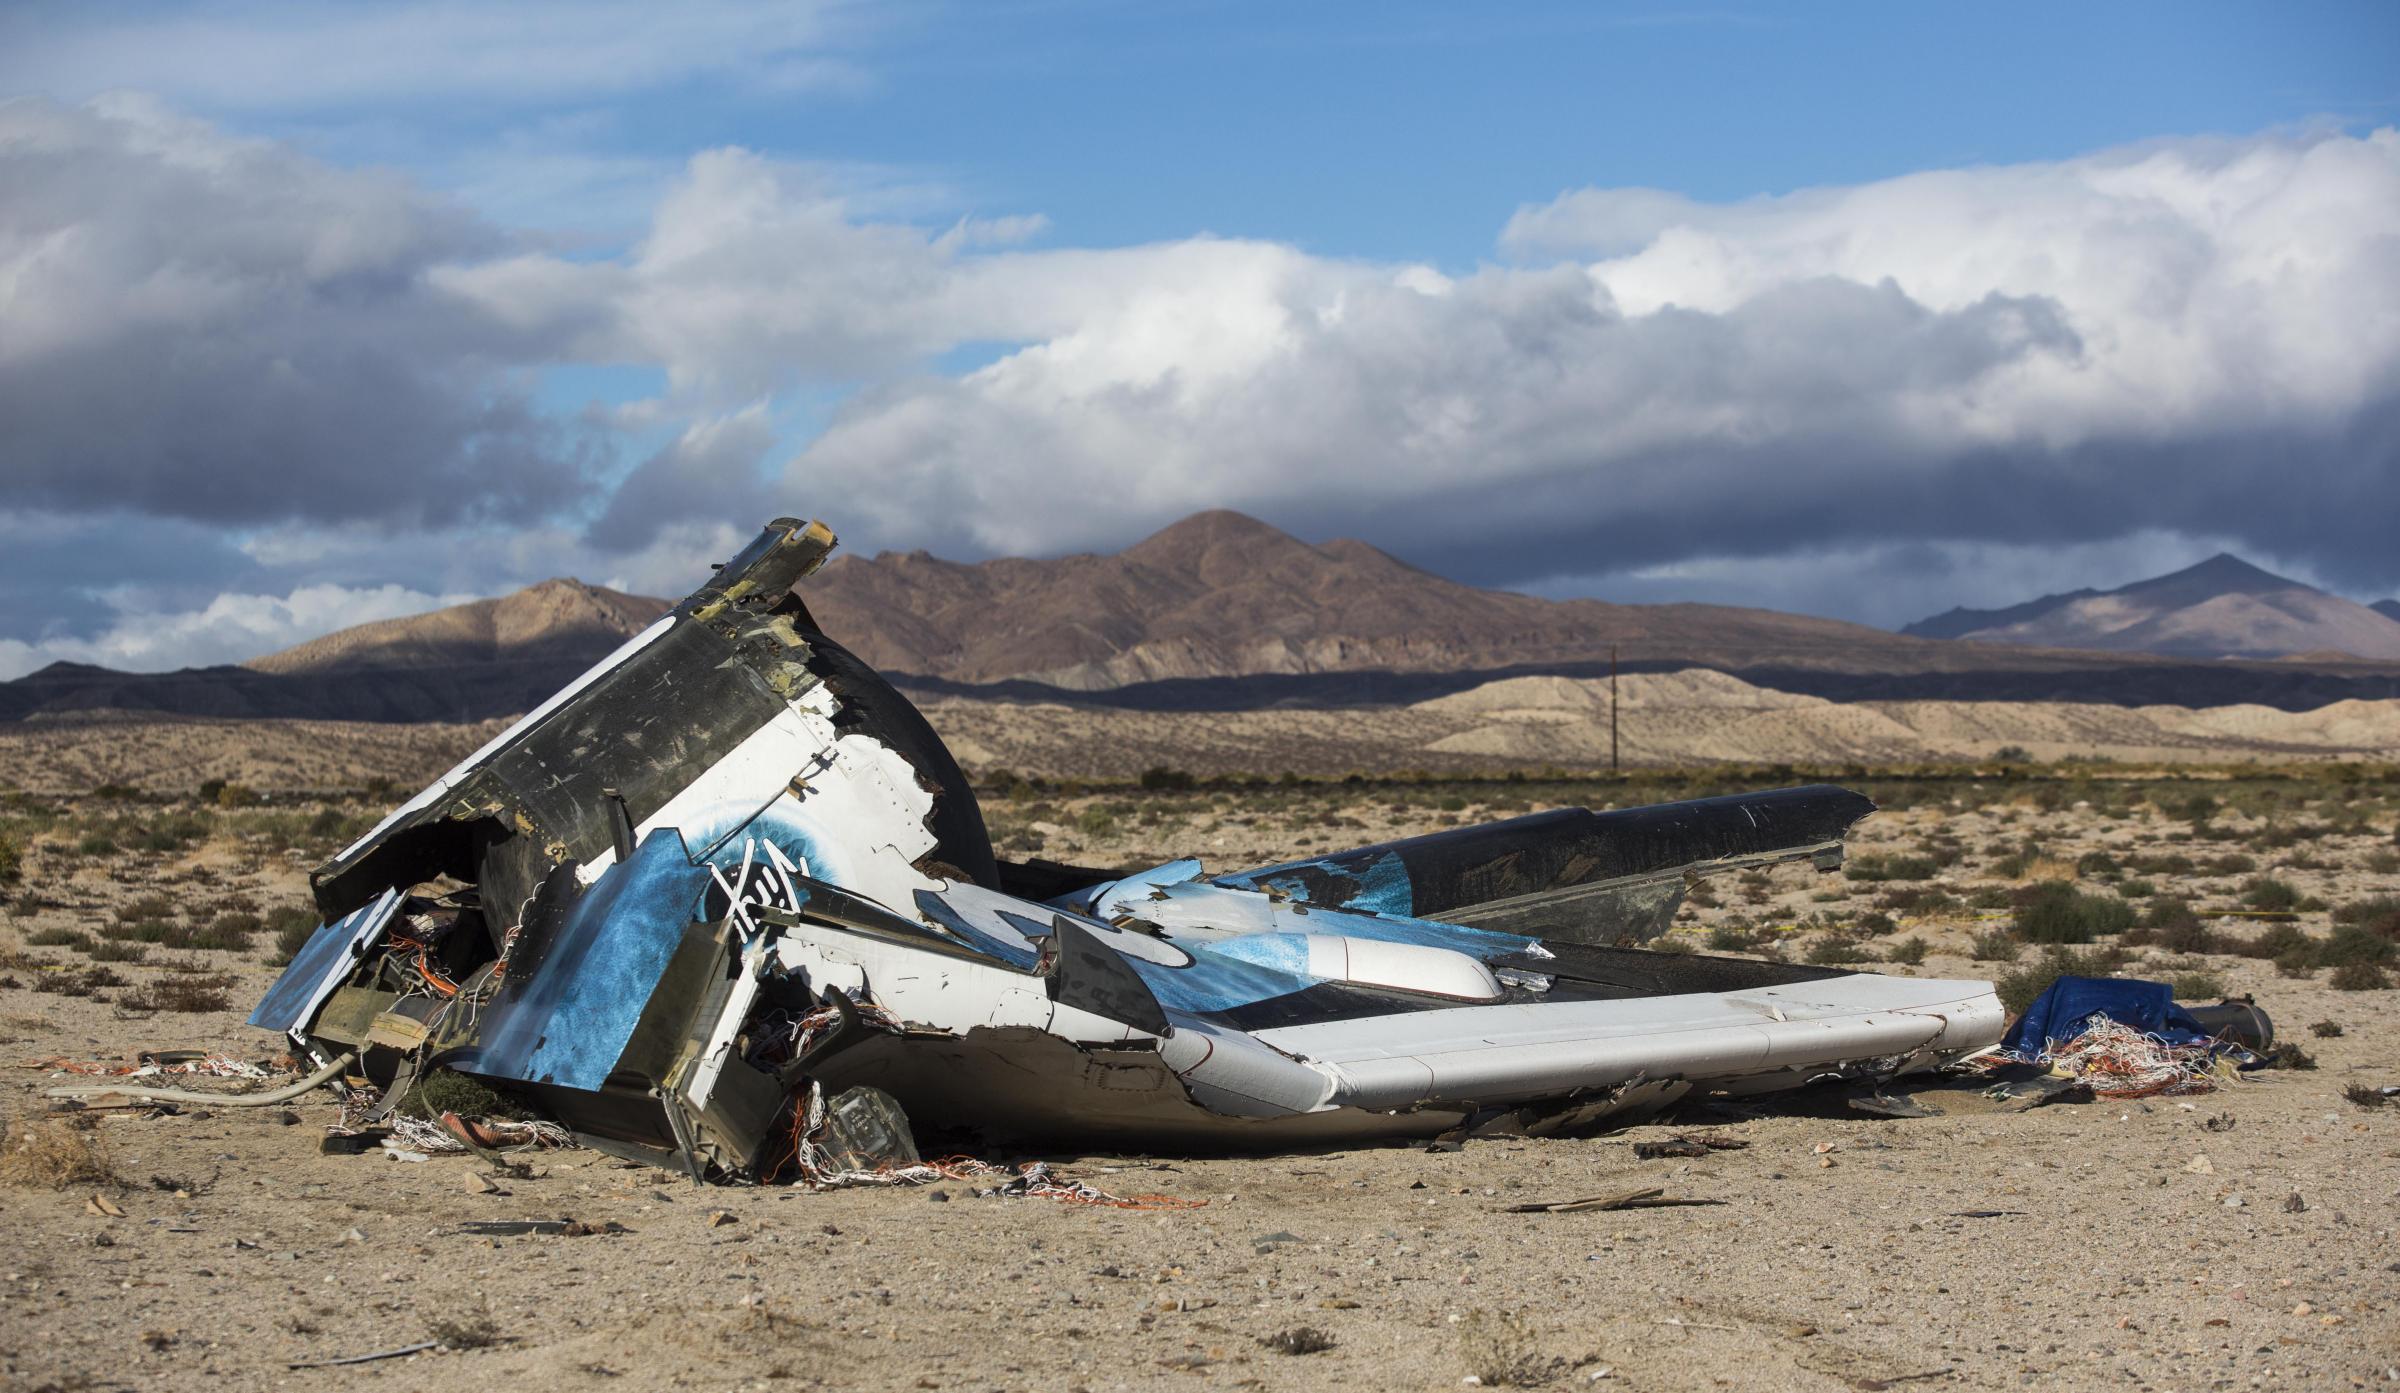 spacecraft crash - photo #9